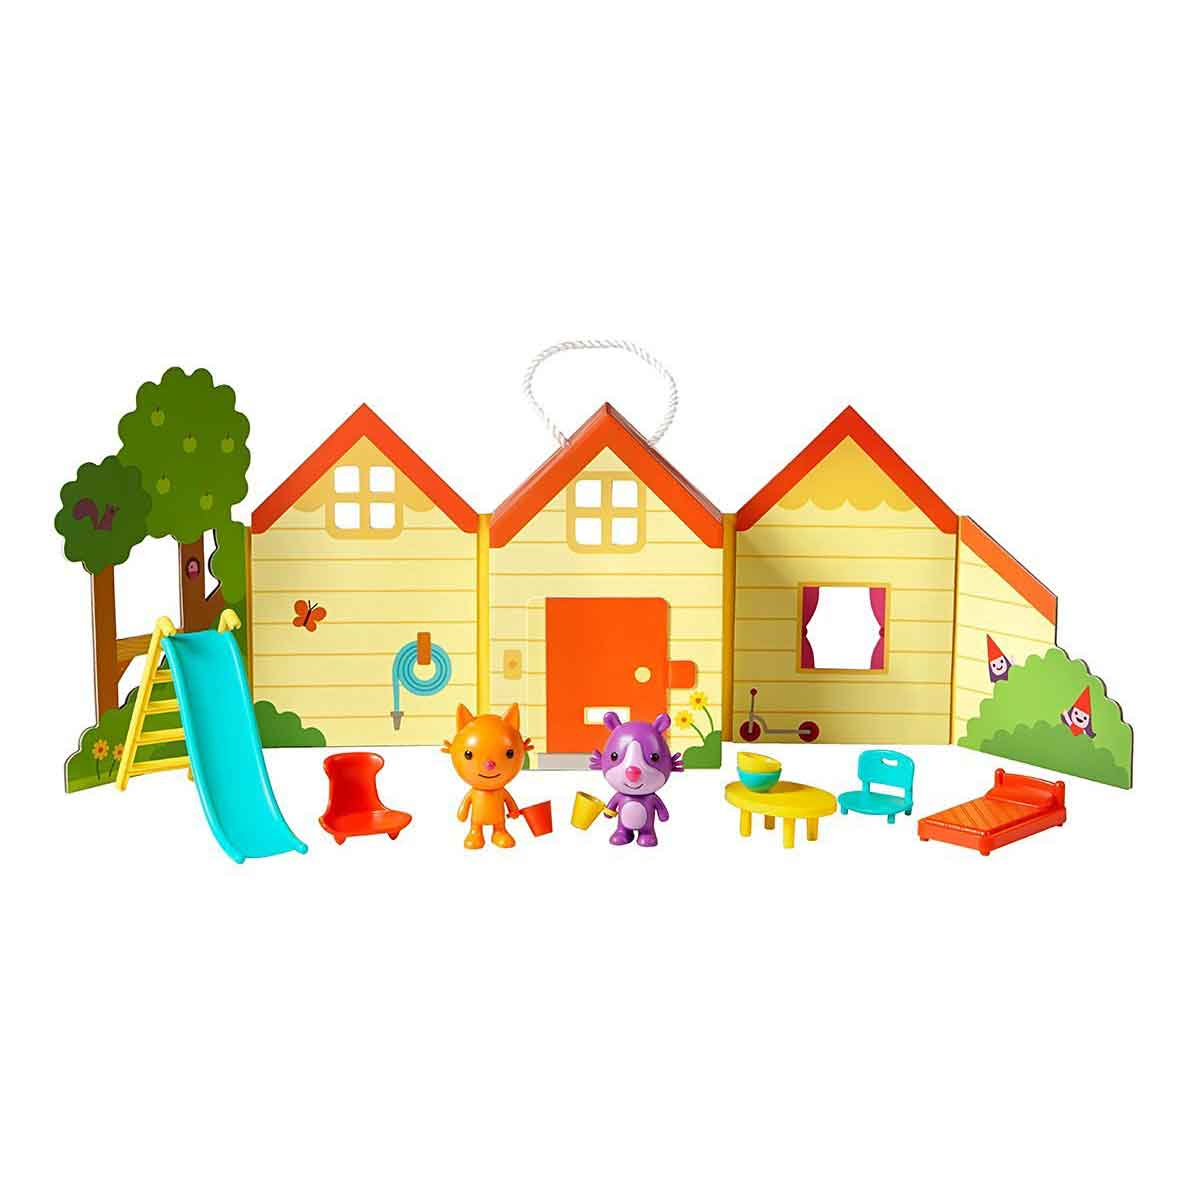 Jinja's House Portable Playset.